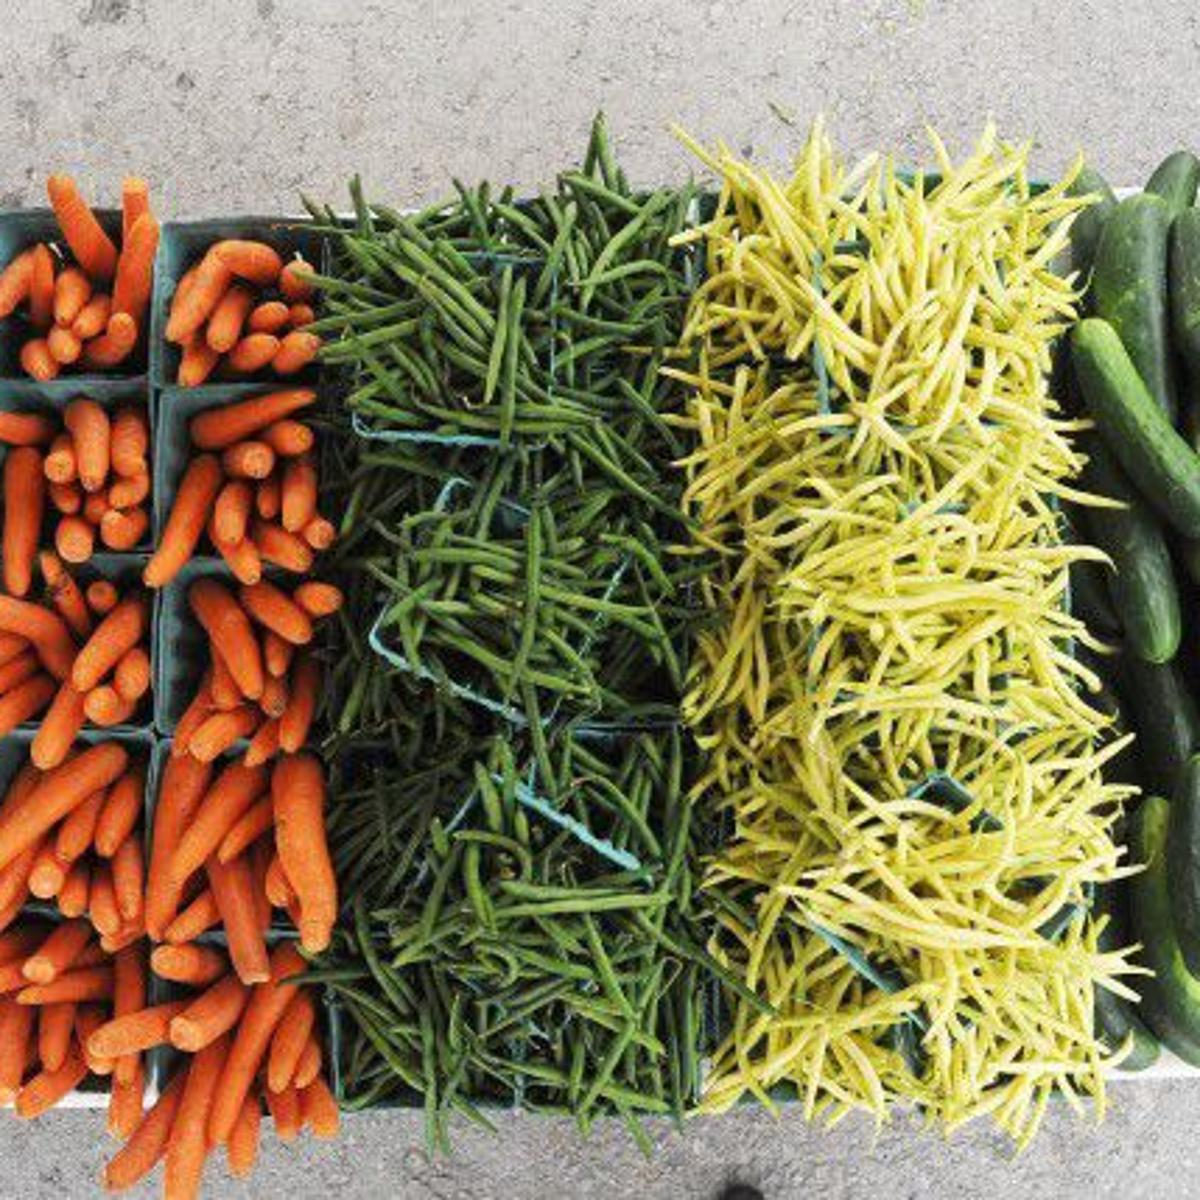 Cosentino: Browsing the Auburn Farmers Market | Lake Life